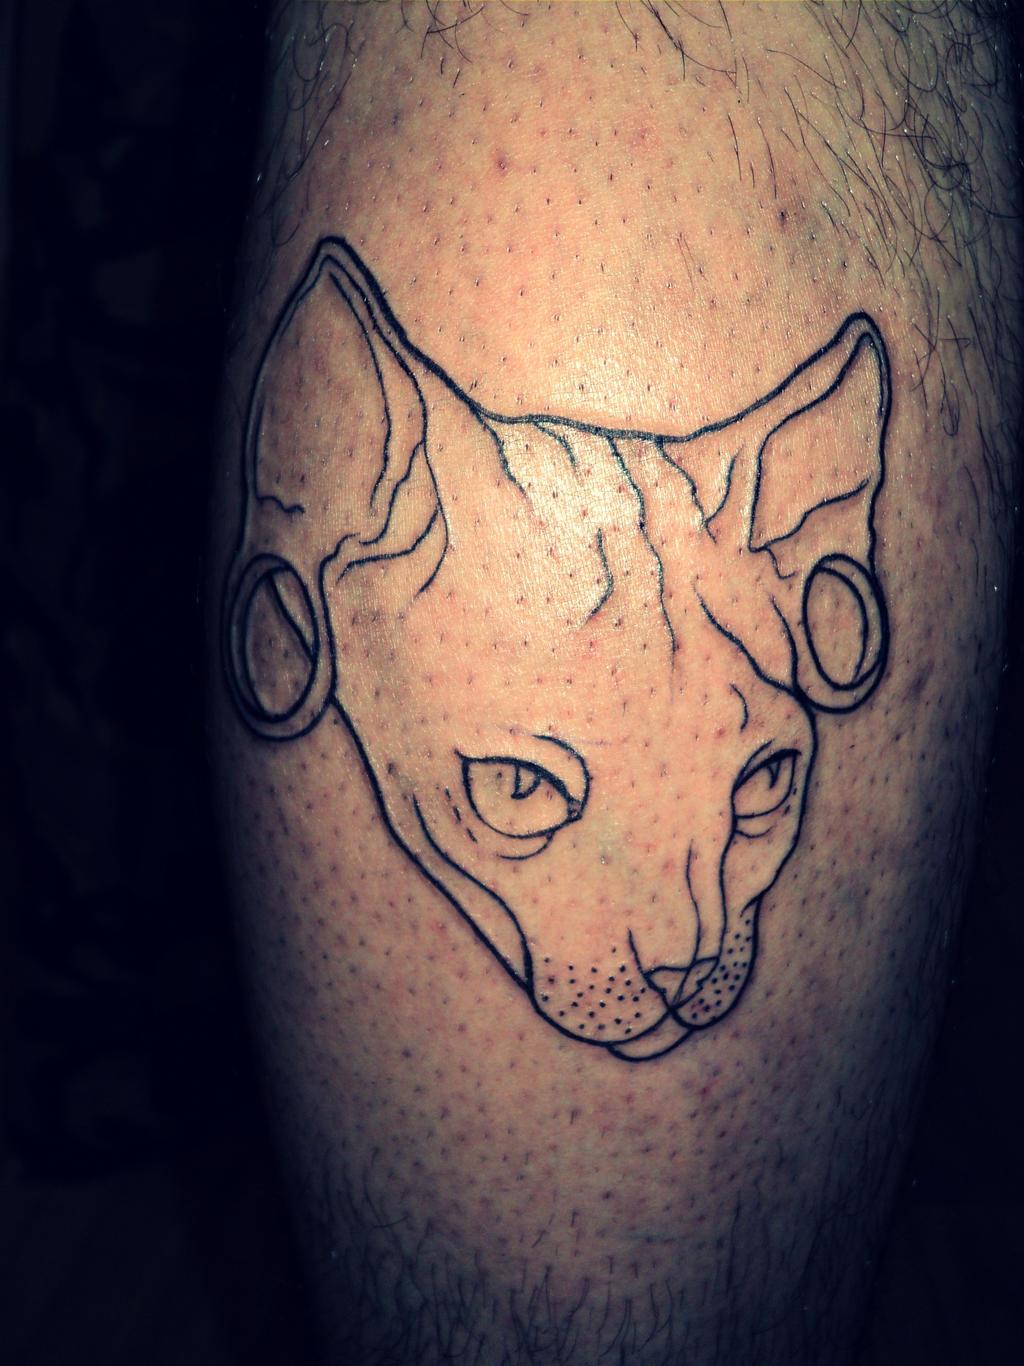 Sphynx cat tattoo by sunshart on deviantart for Hairless cat tattoo